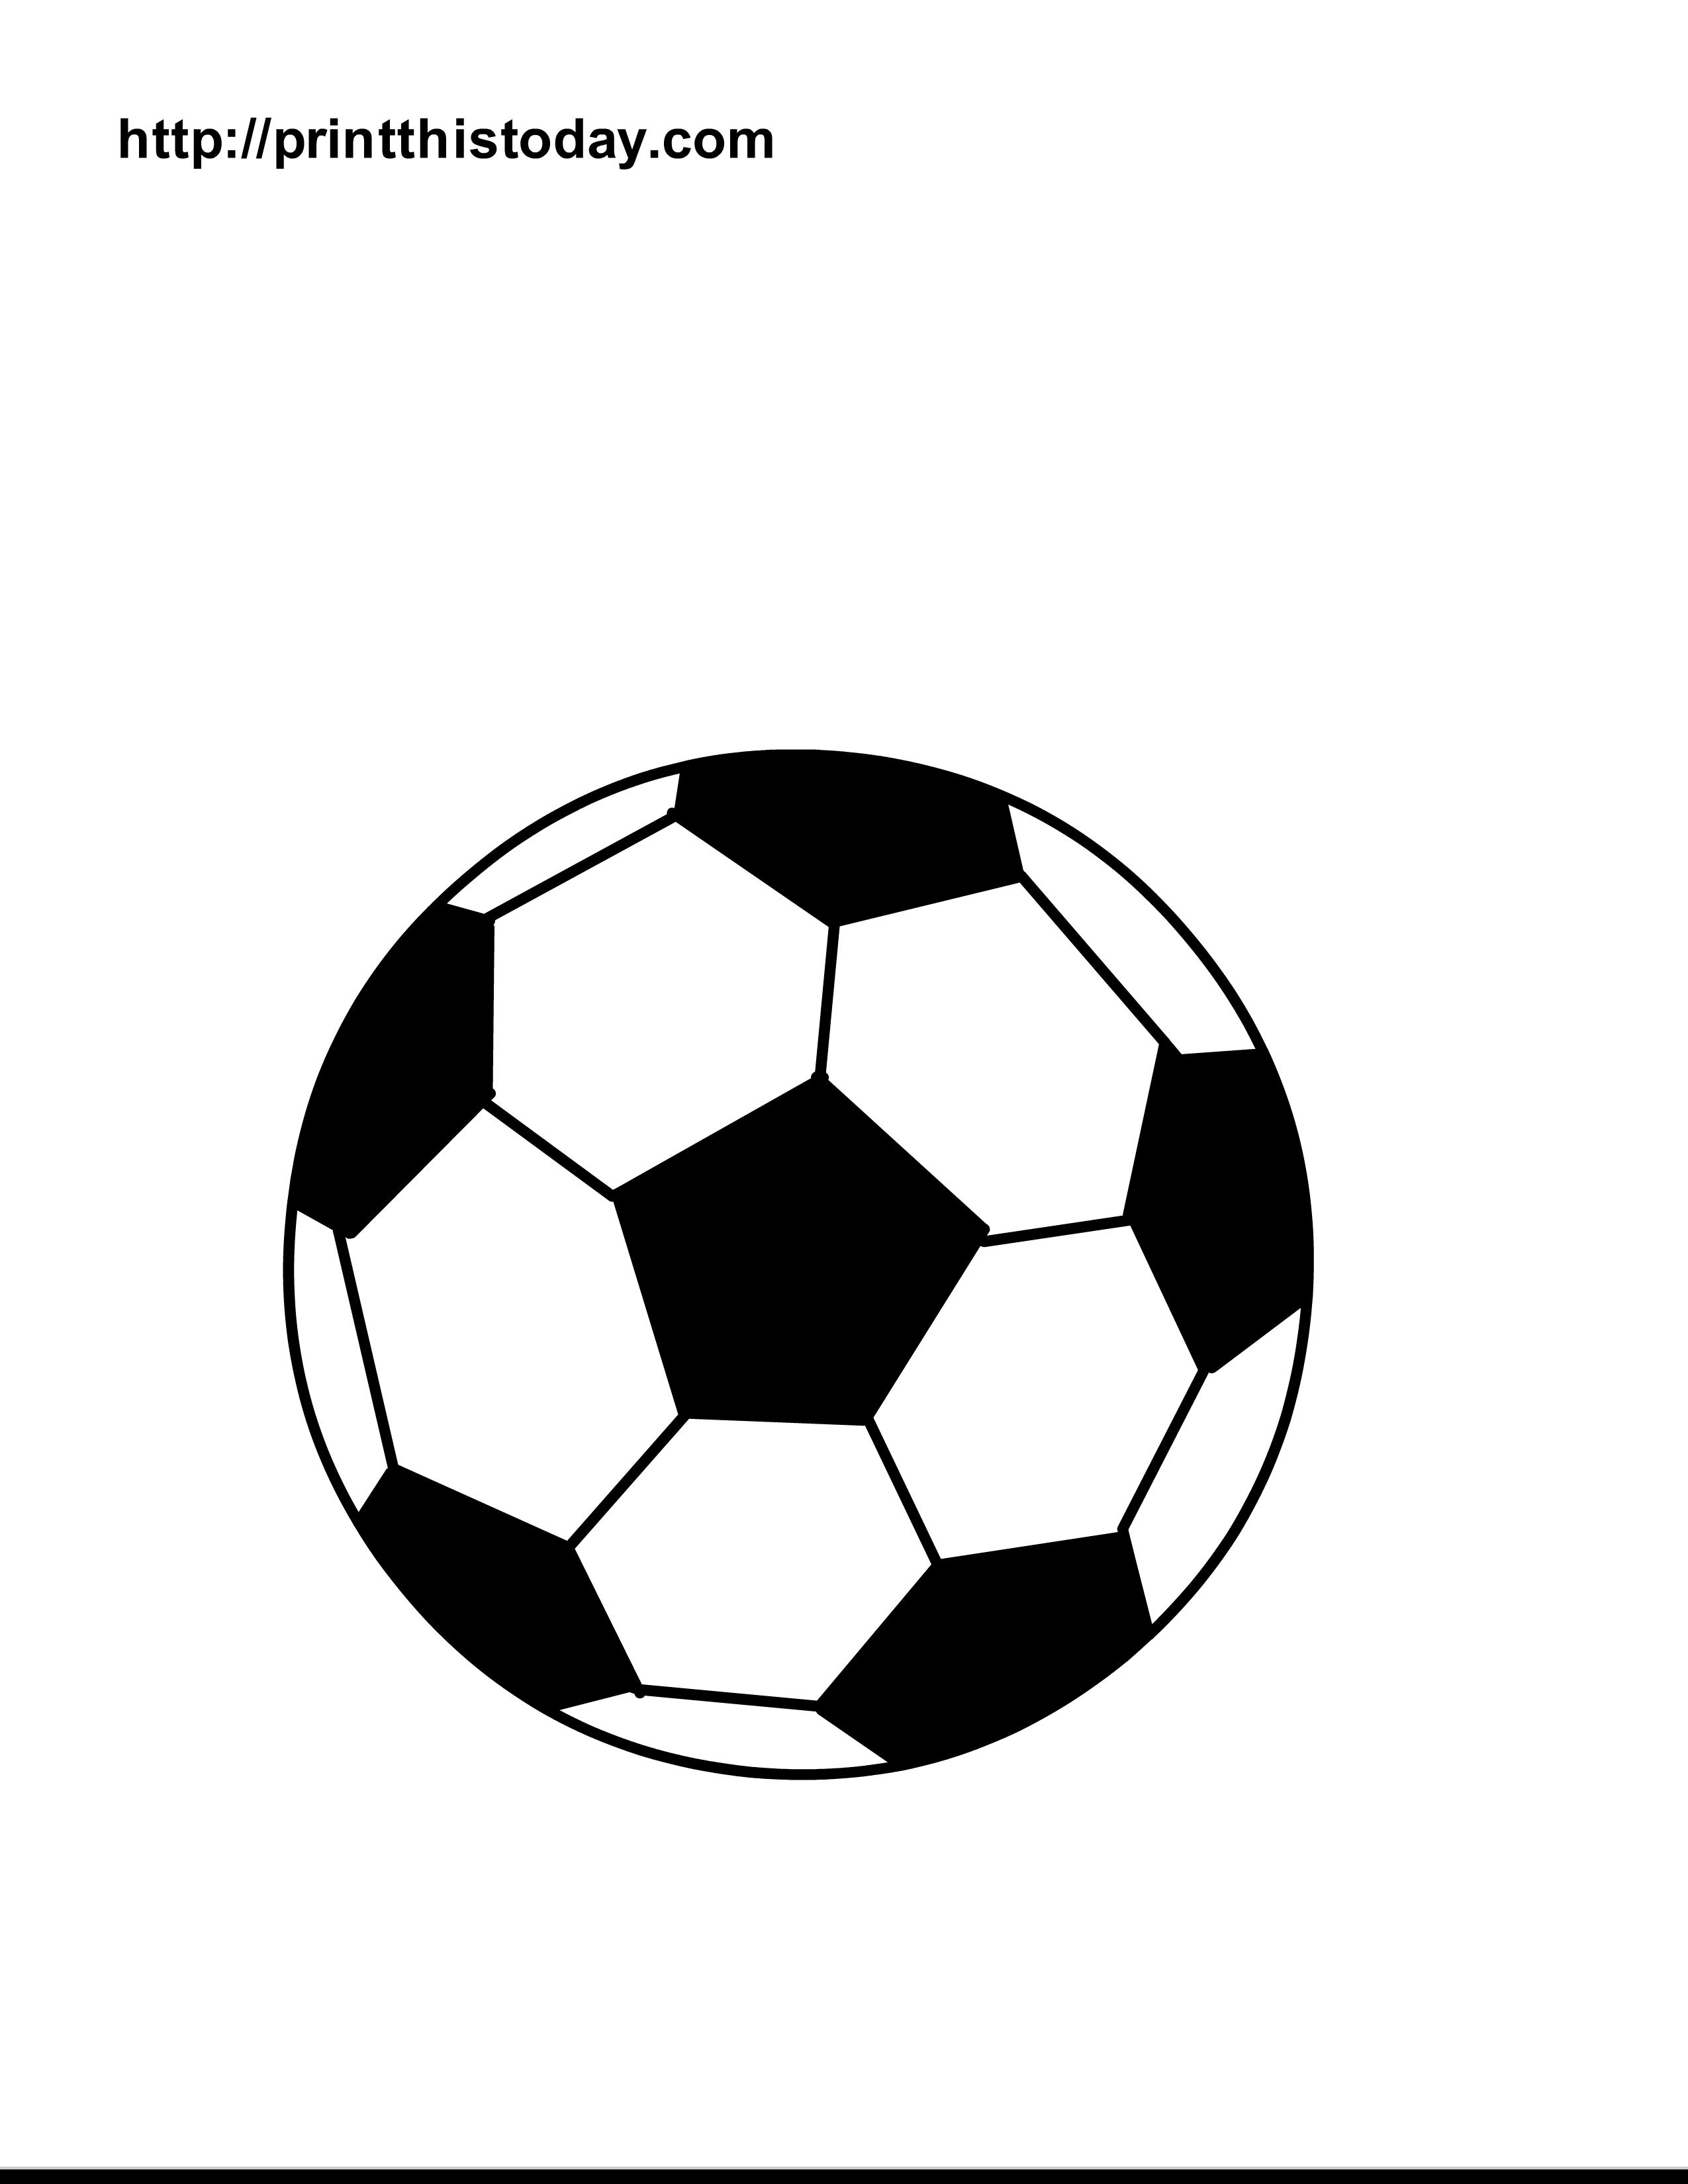 How To Draw A Soccer Ball - ClipArt Best | Soccer | Pinterest ...